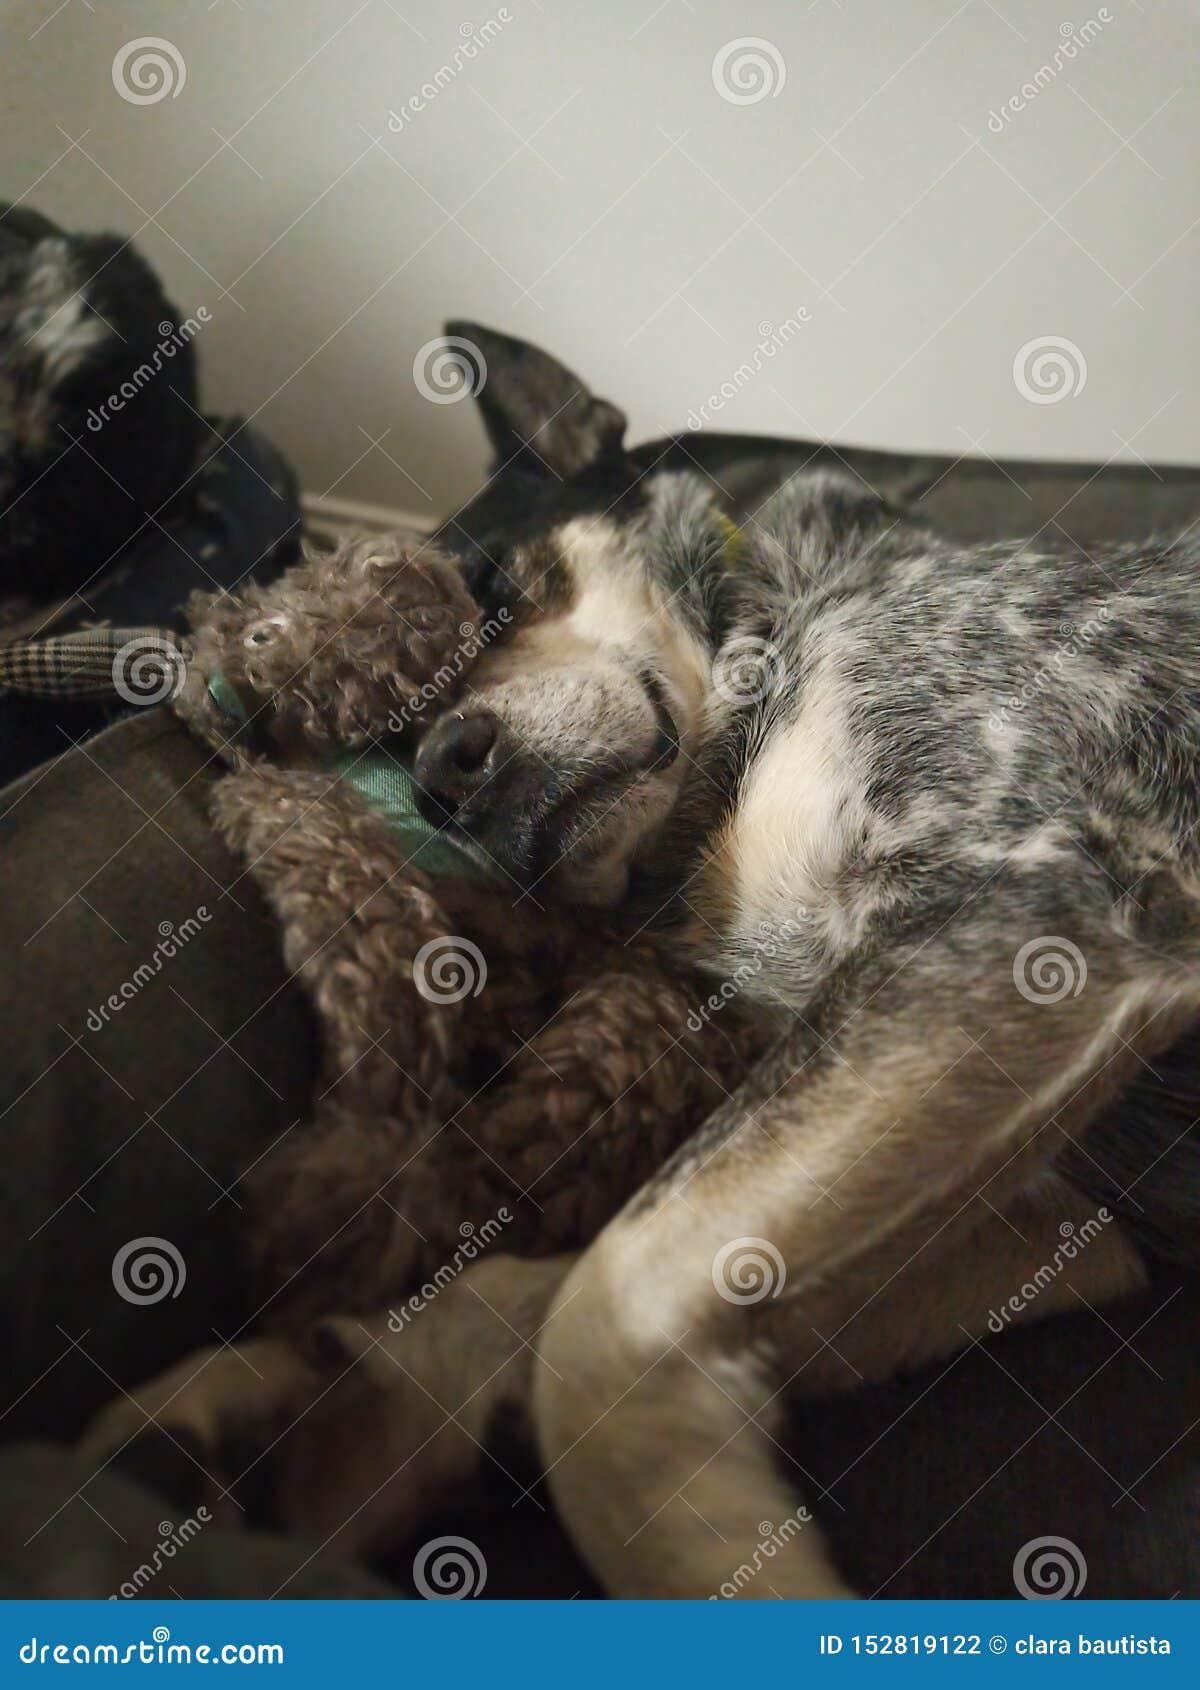 Doggo för söta drömmar